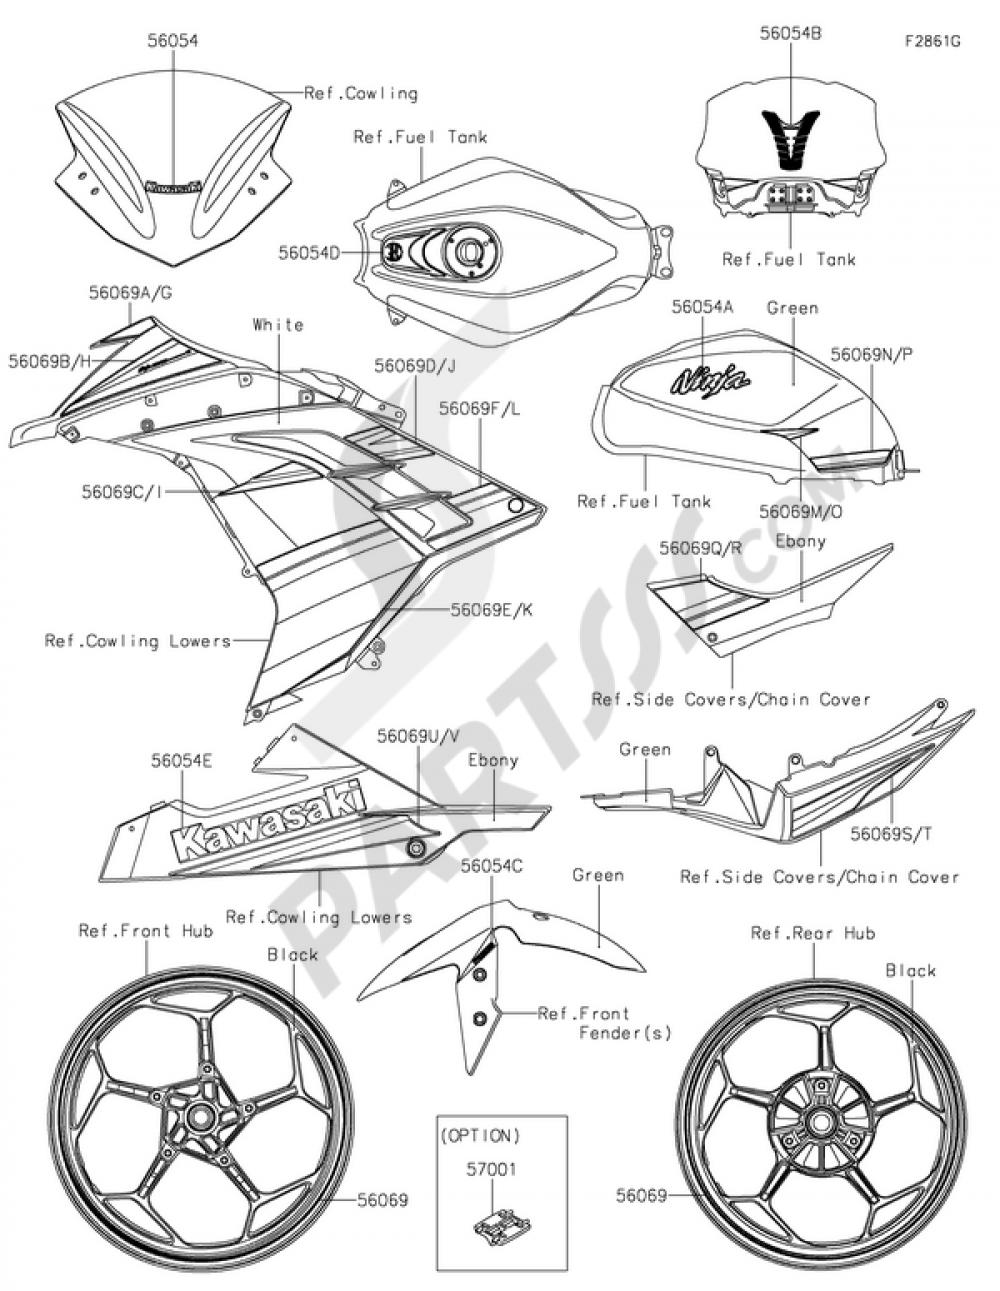 Decalsgreenbffa Kawasaki Ninja 300 Abs 2014 Engine Diagram